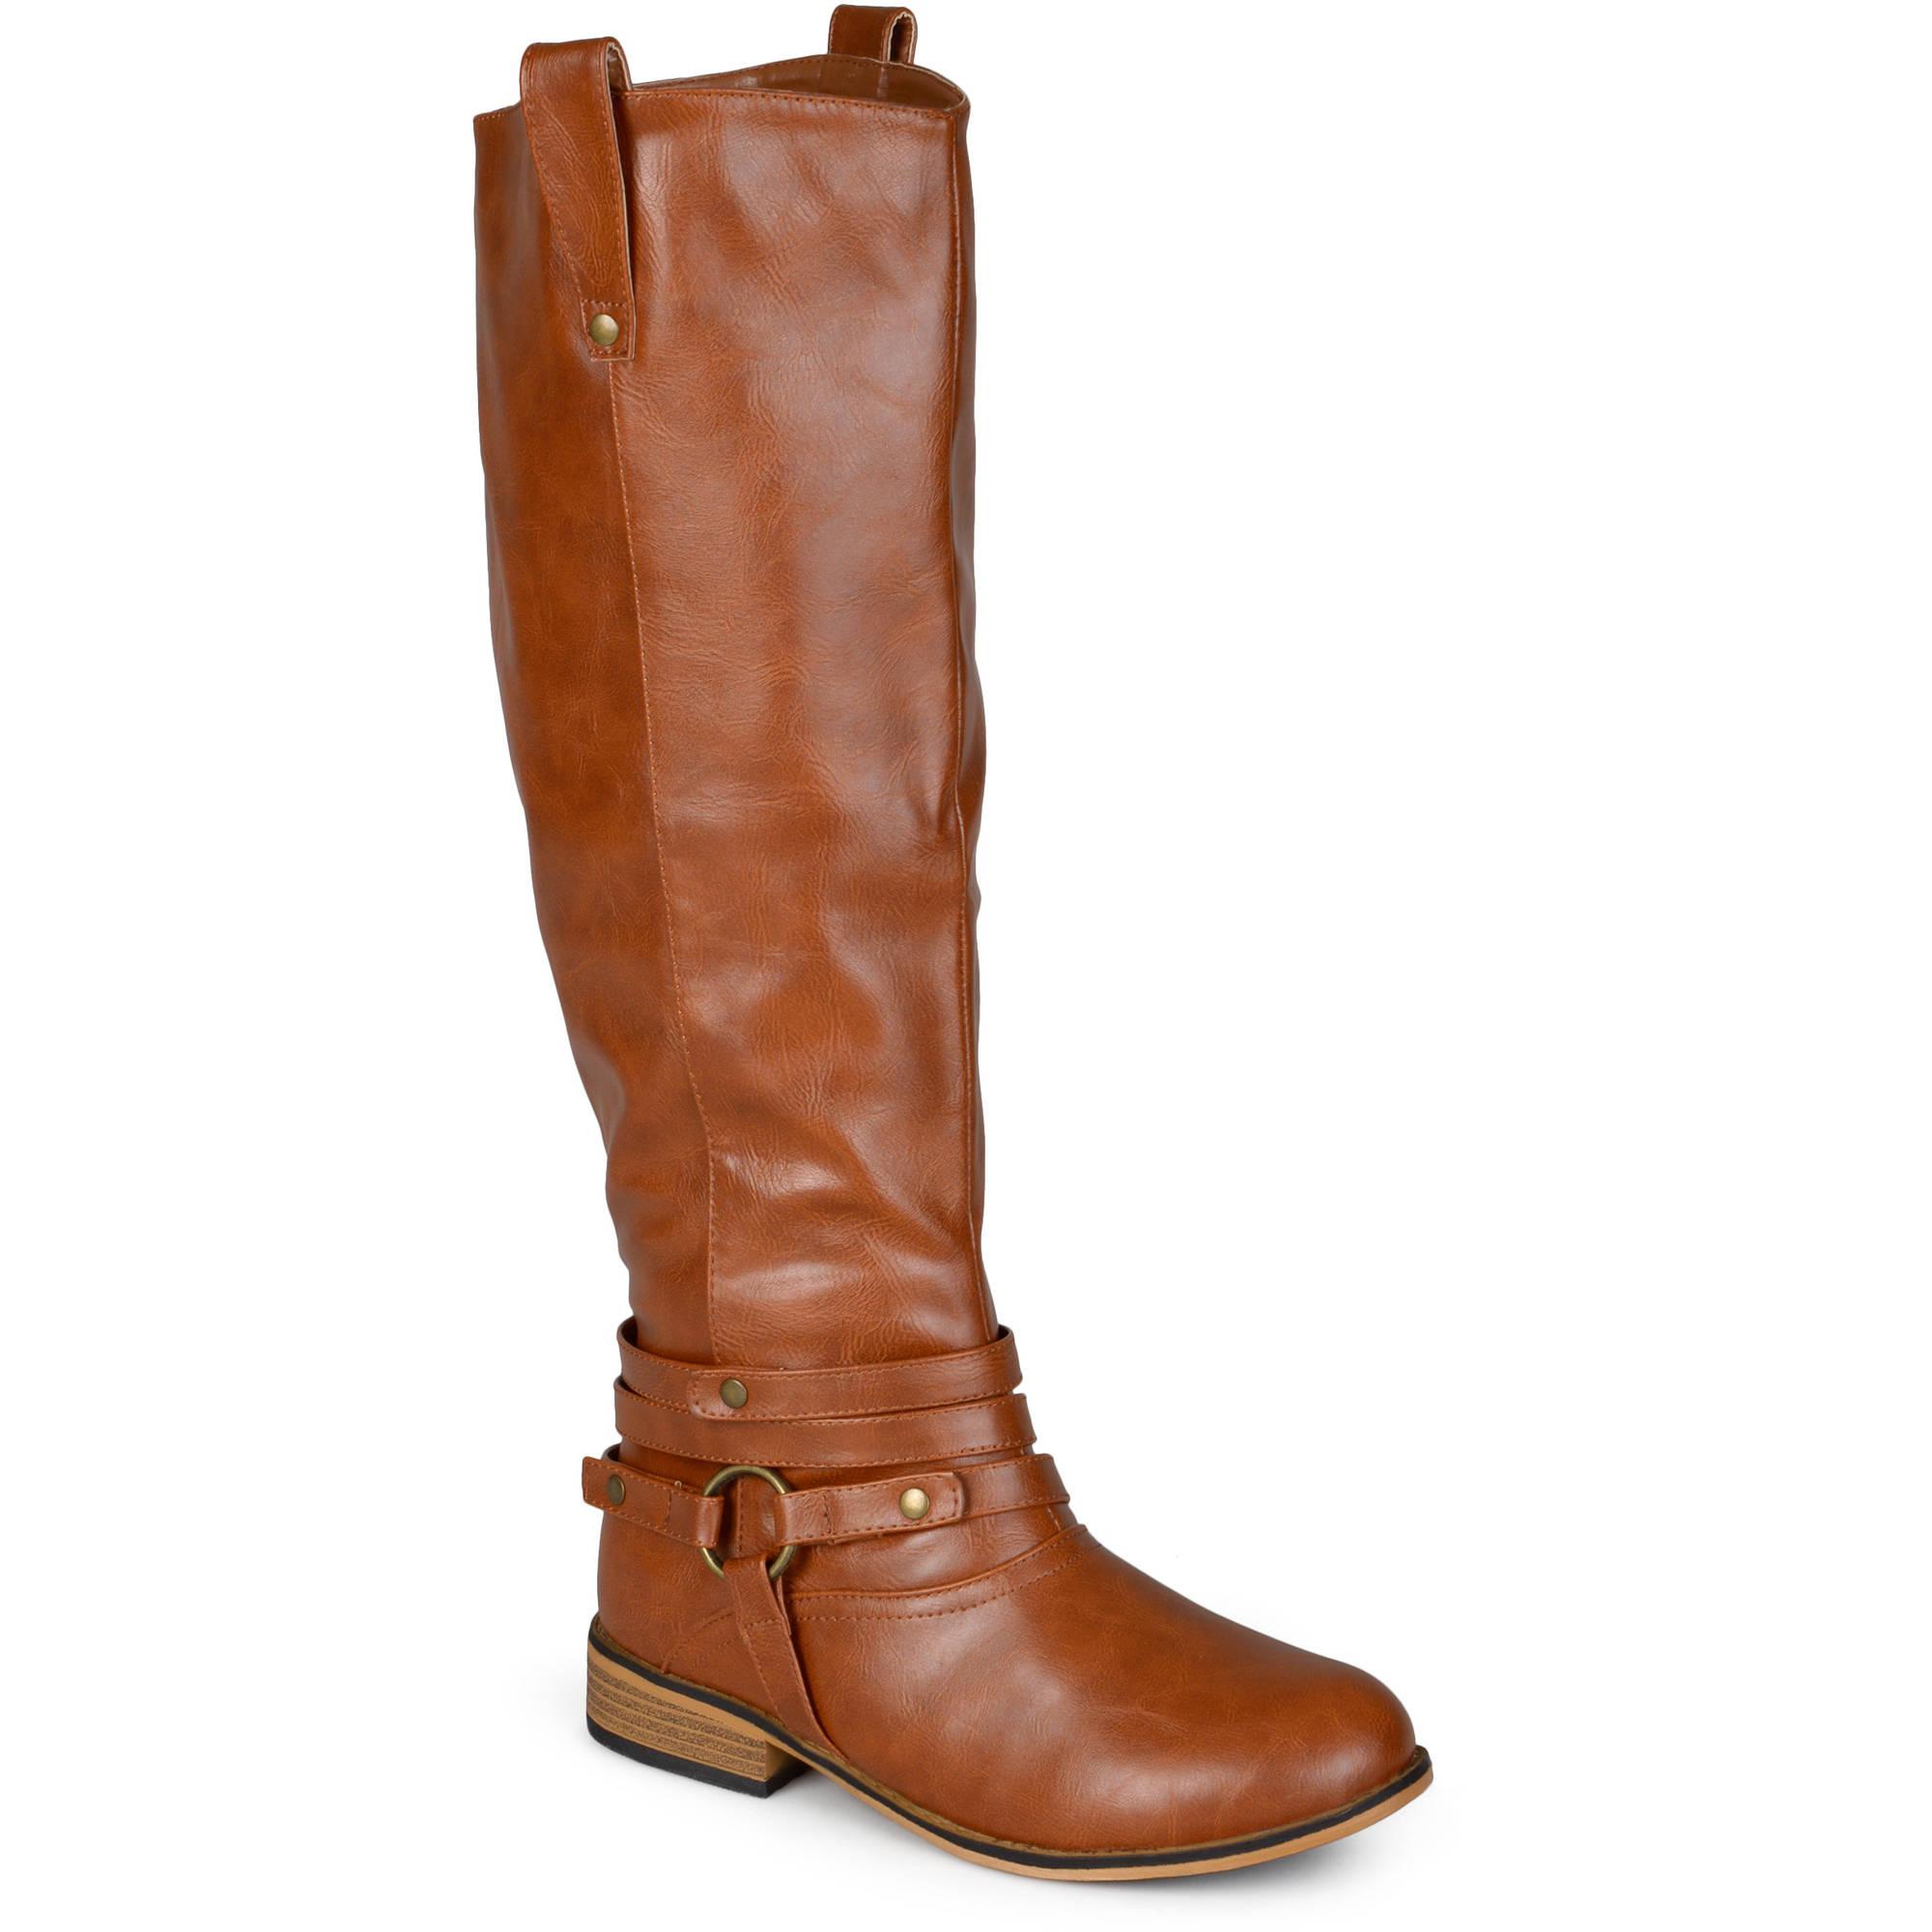 Women's Mid-calf Riding Boots